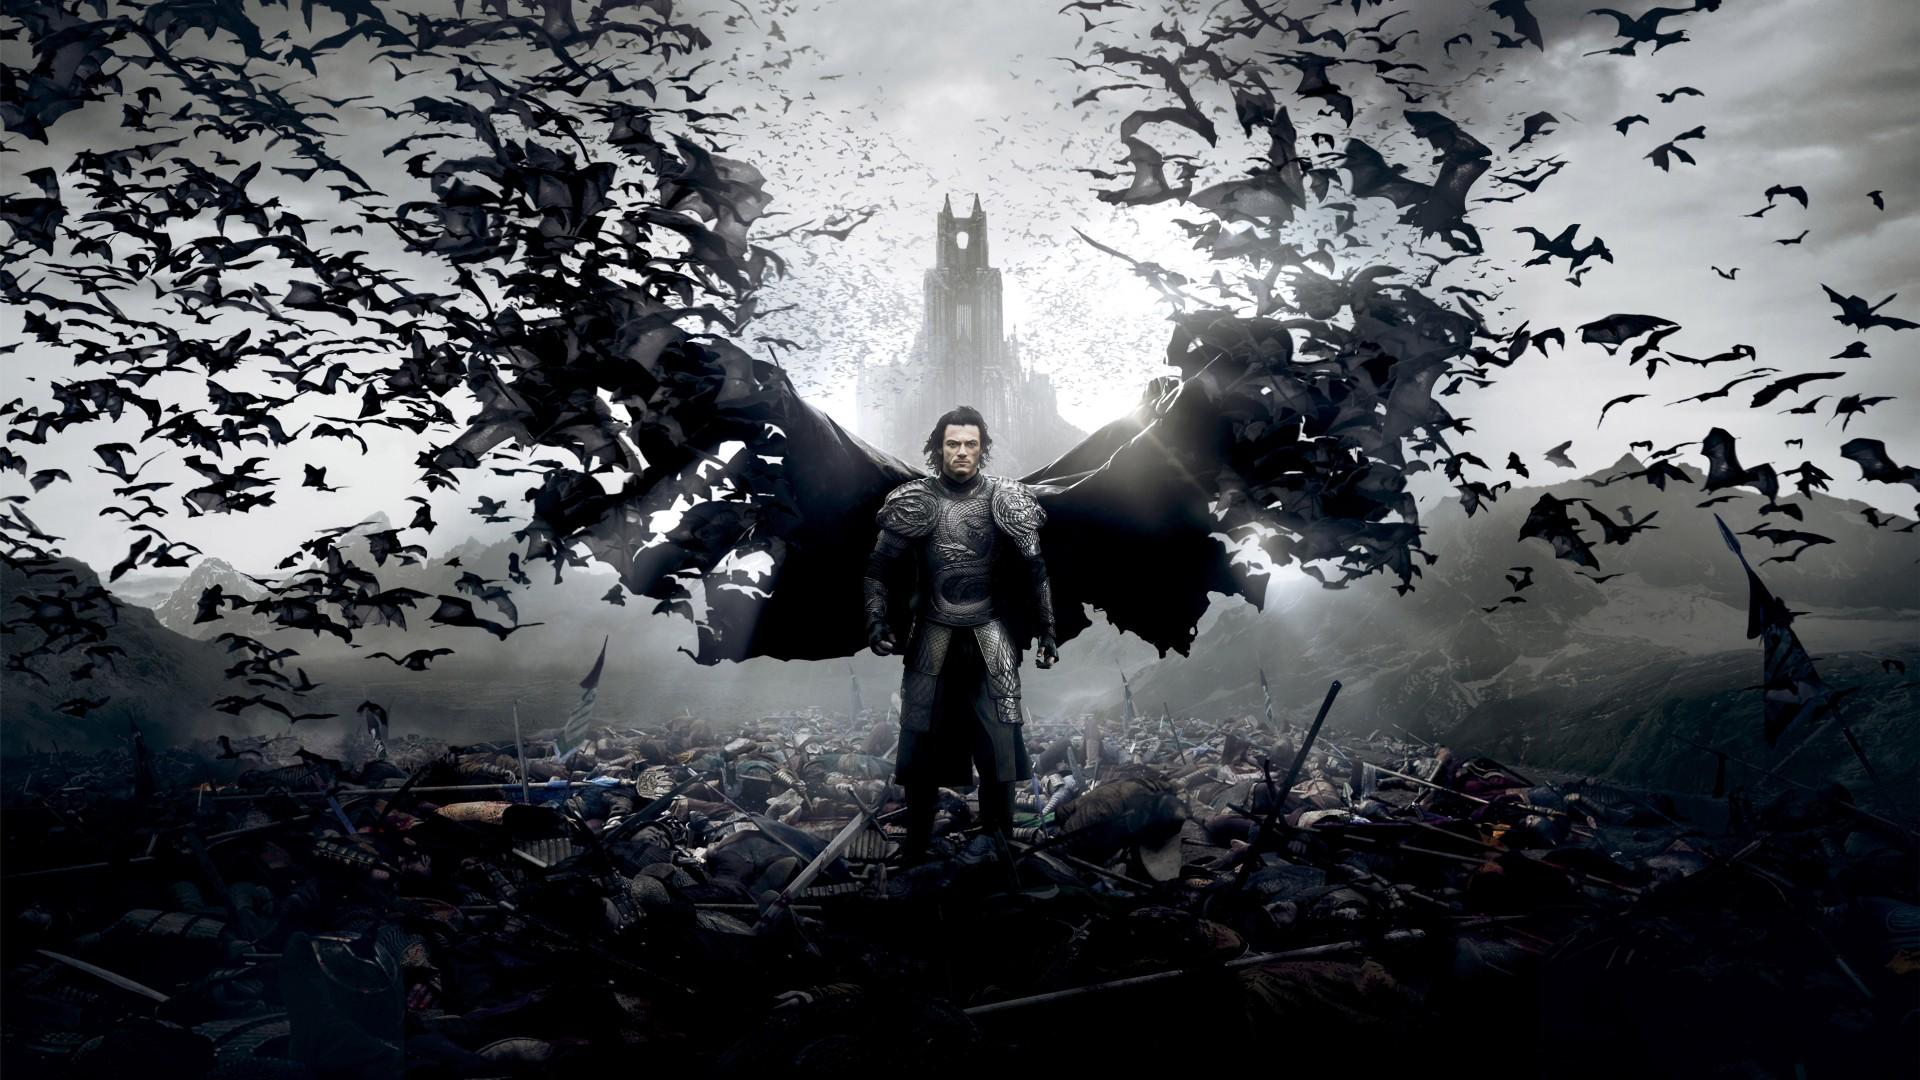 Dracula Wallpaper, Movies / Recent: Dracula, Untold, film, movie, Vlad ...